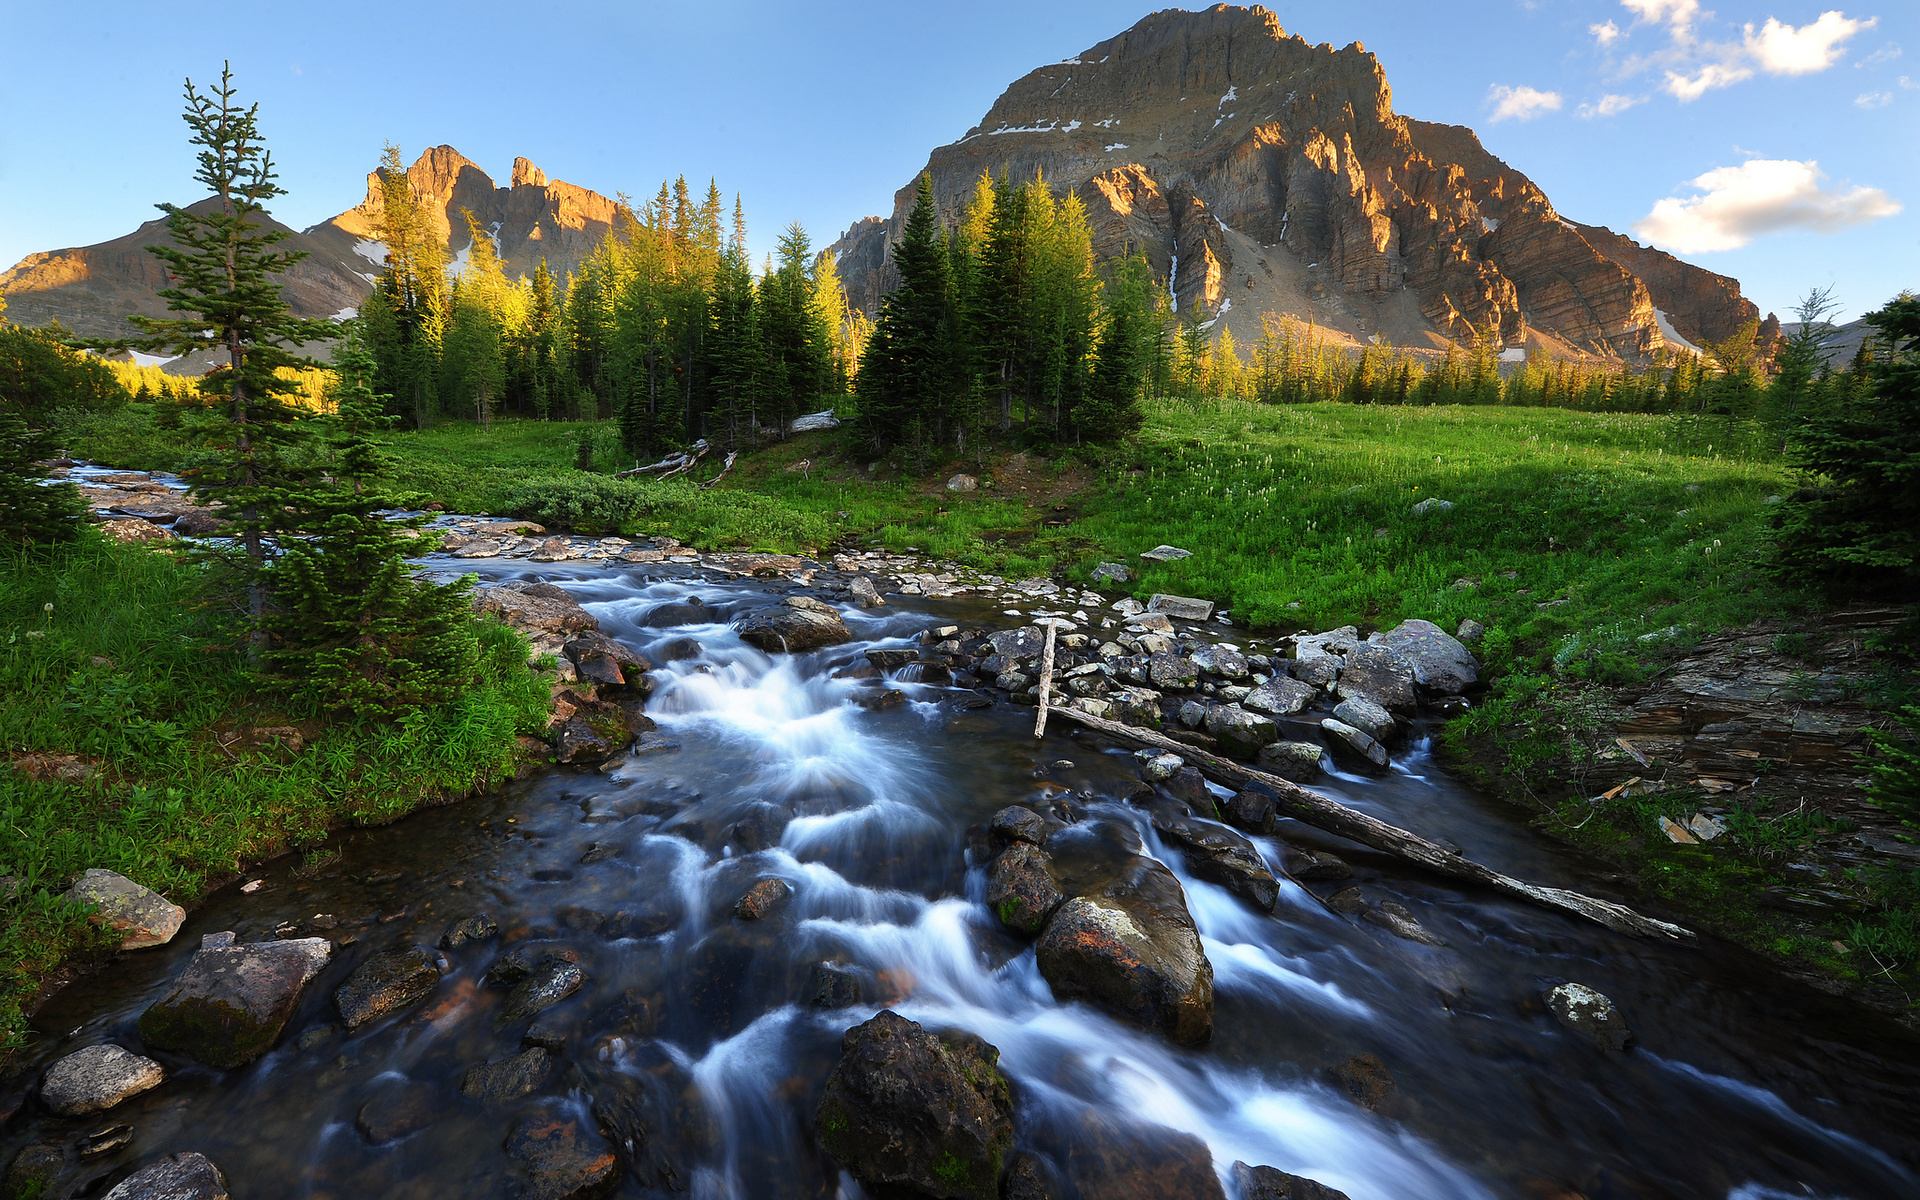 Wilderness clipart stream  Clipart wallpaper Mountain Mountain